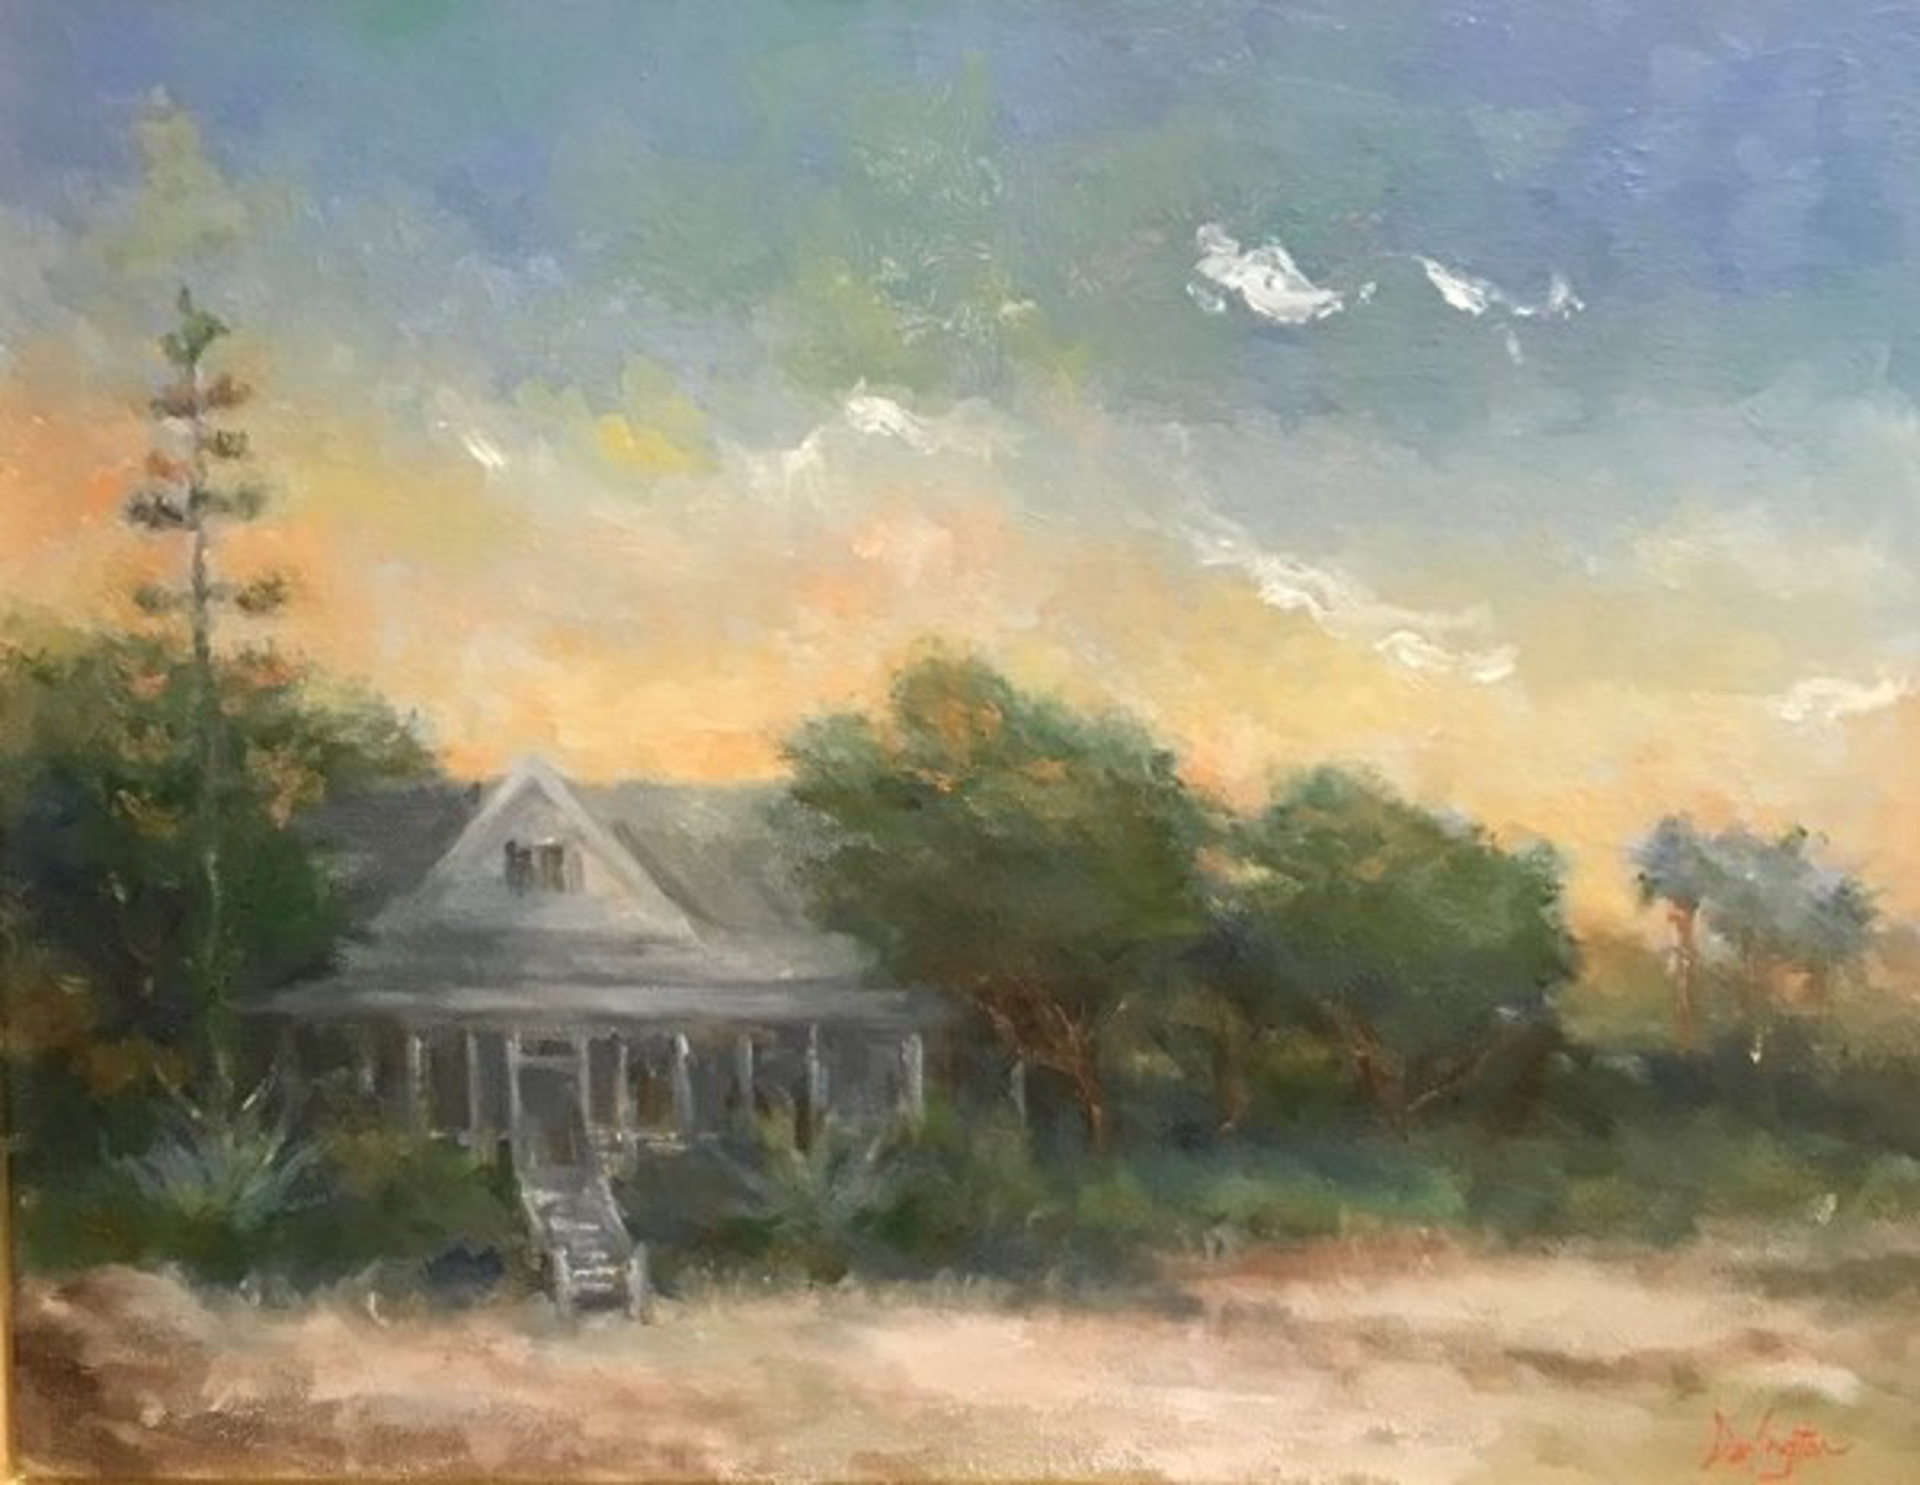 Blooming Yuca by Jim Darlington